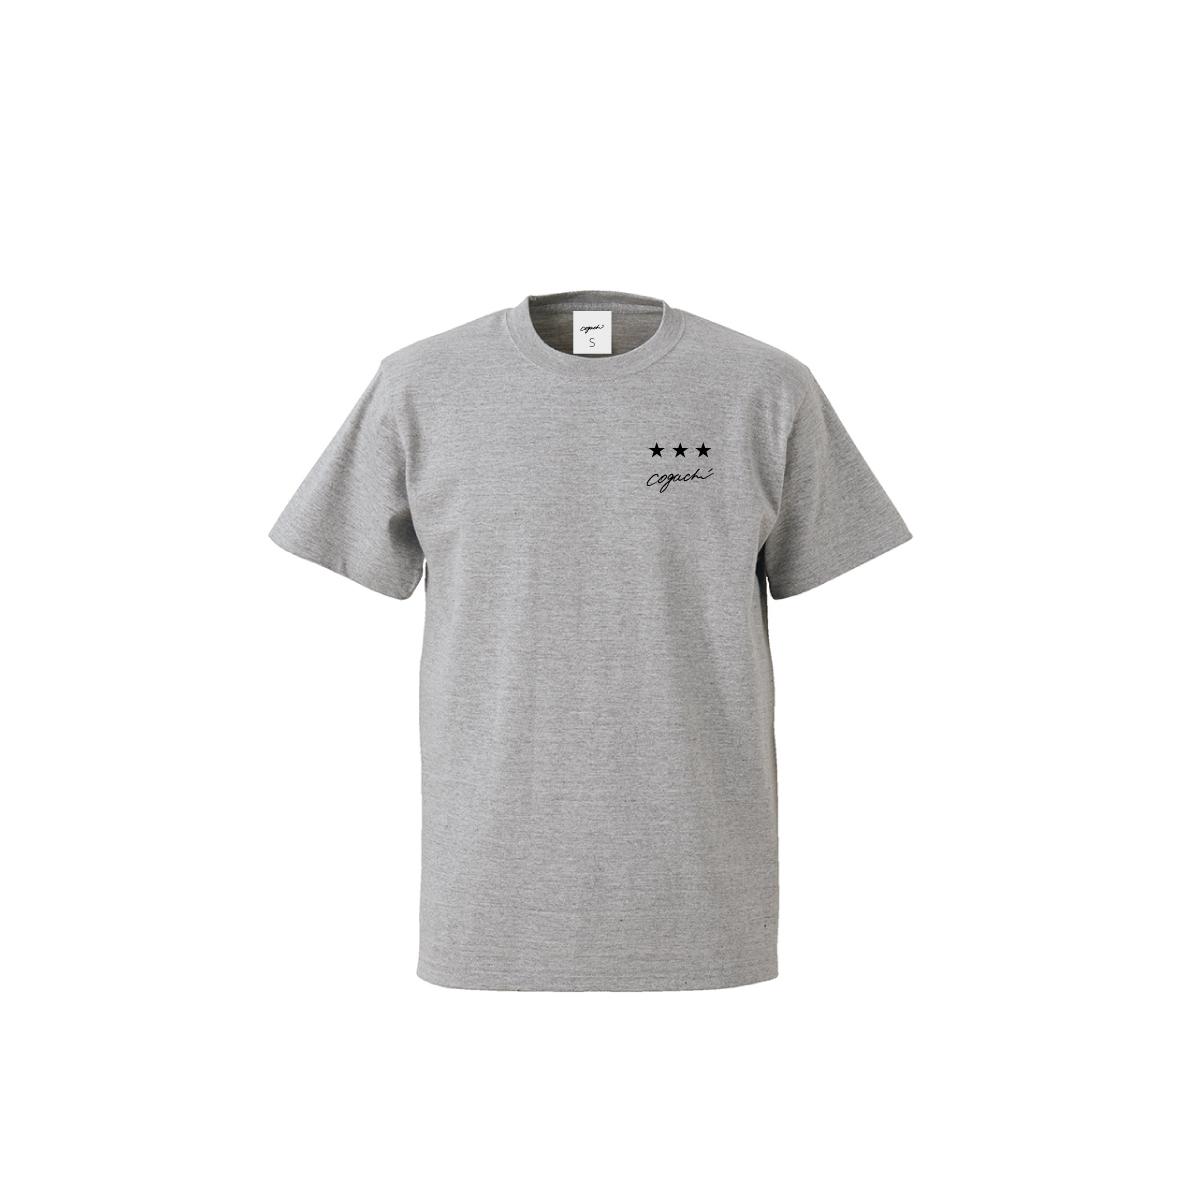 ST T-shirt(HEATHER GRAY)